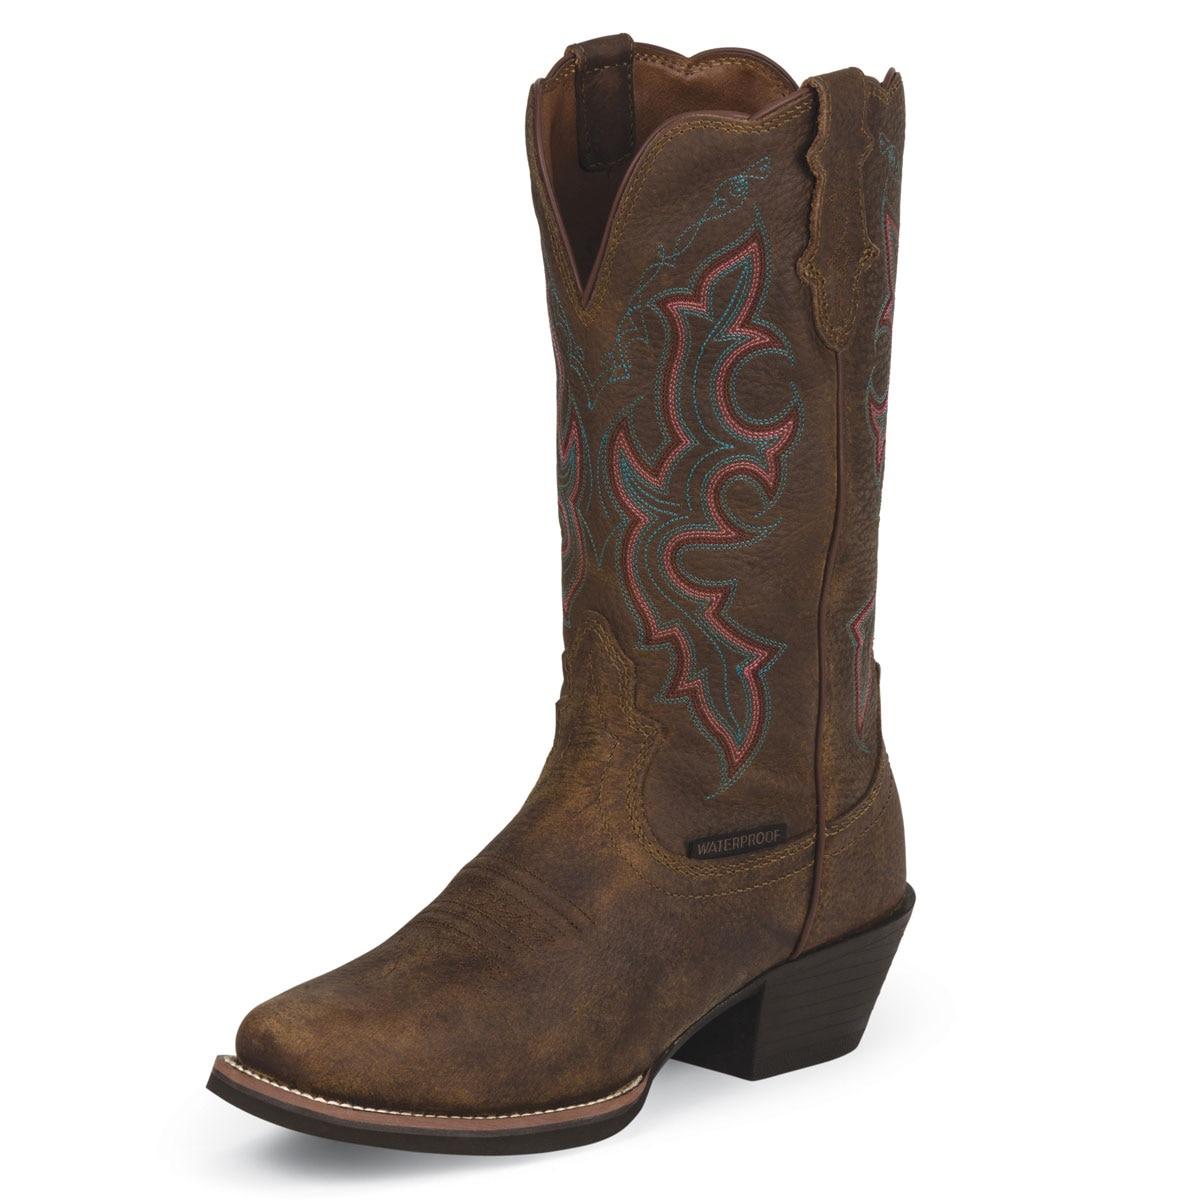 Justin Women's Waterproof Stampede Boots